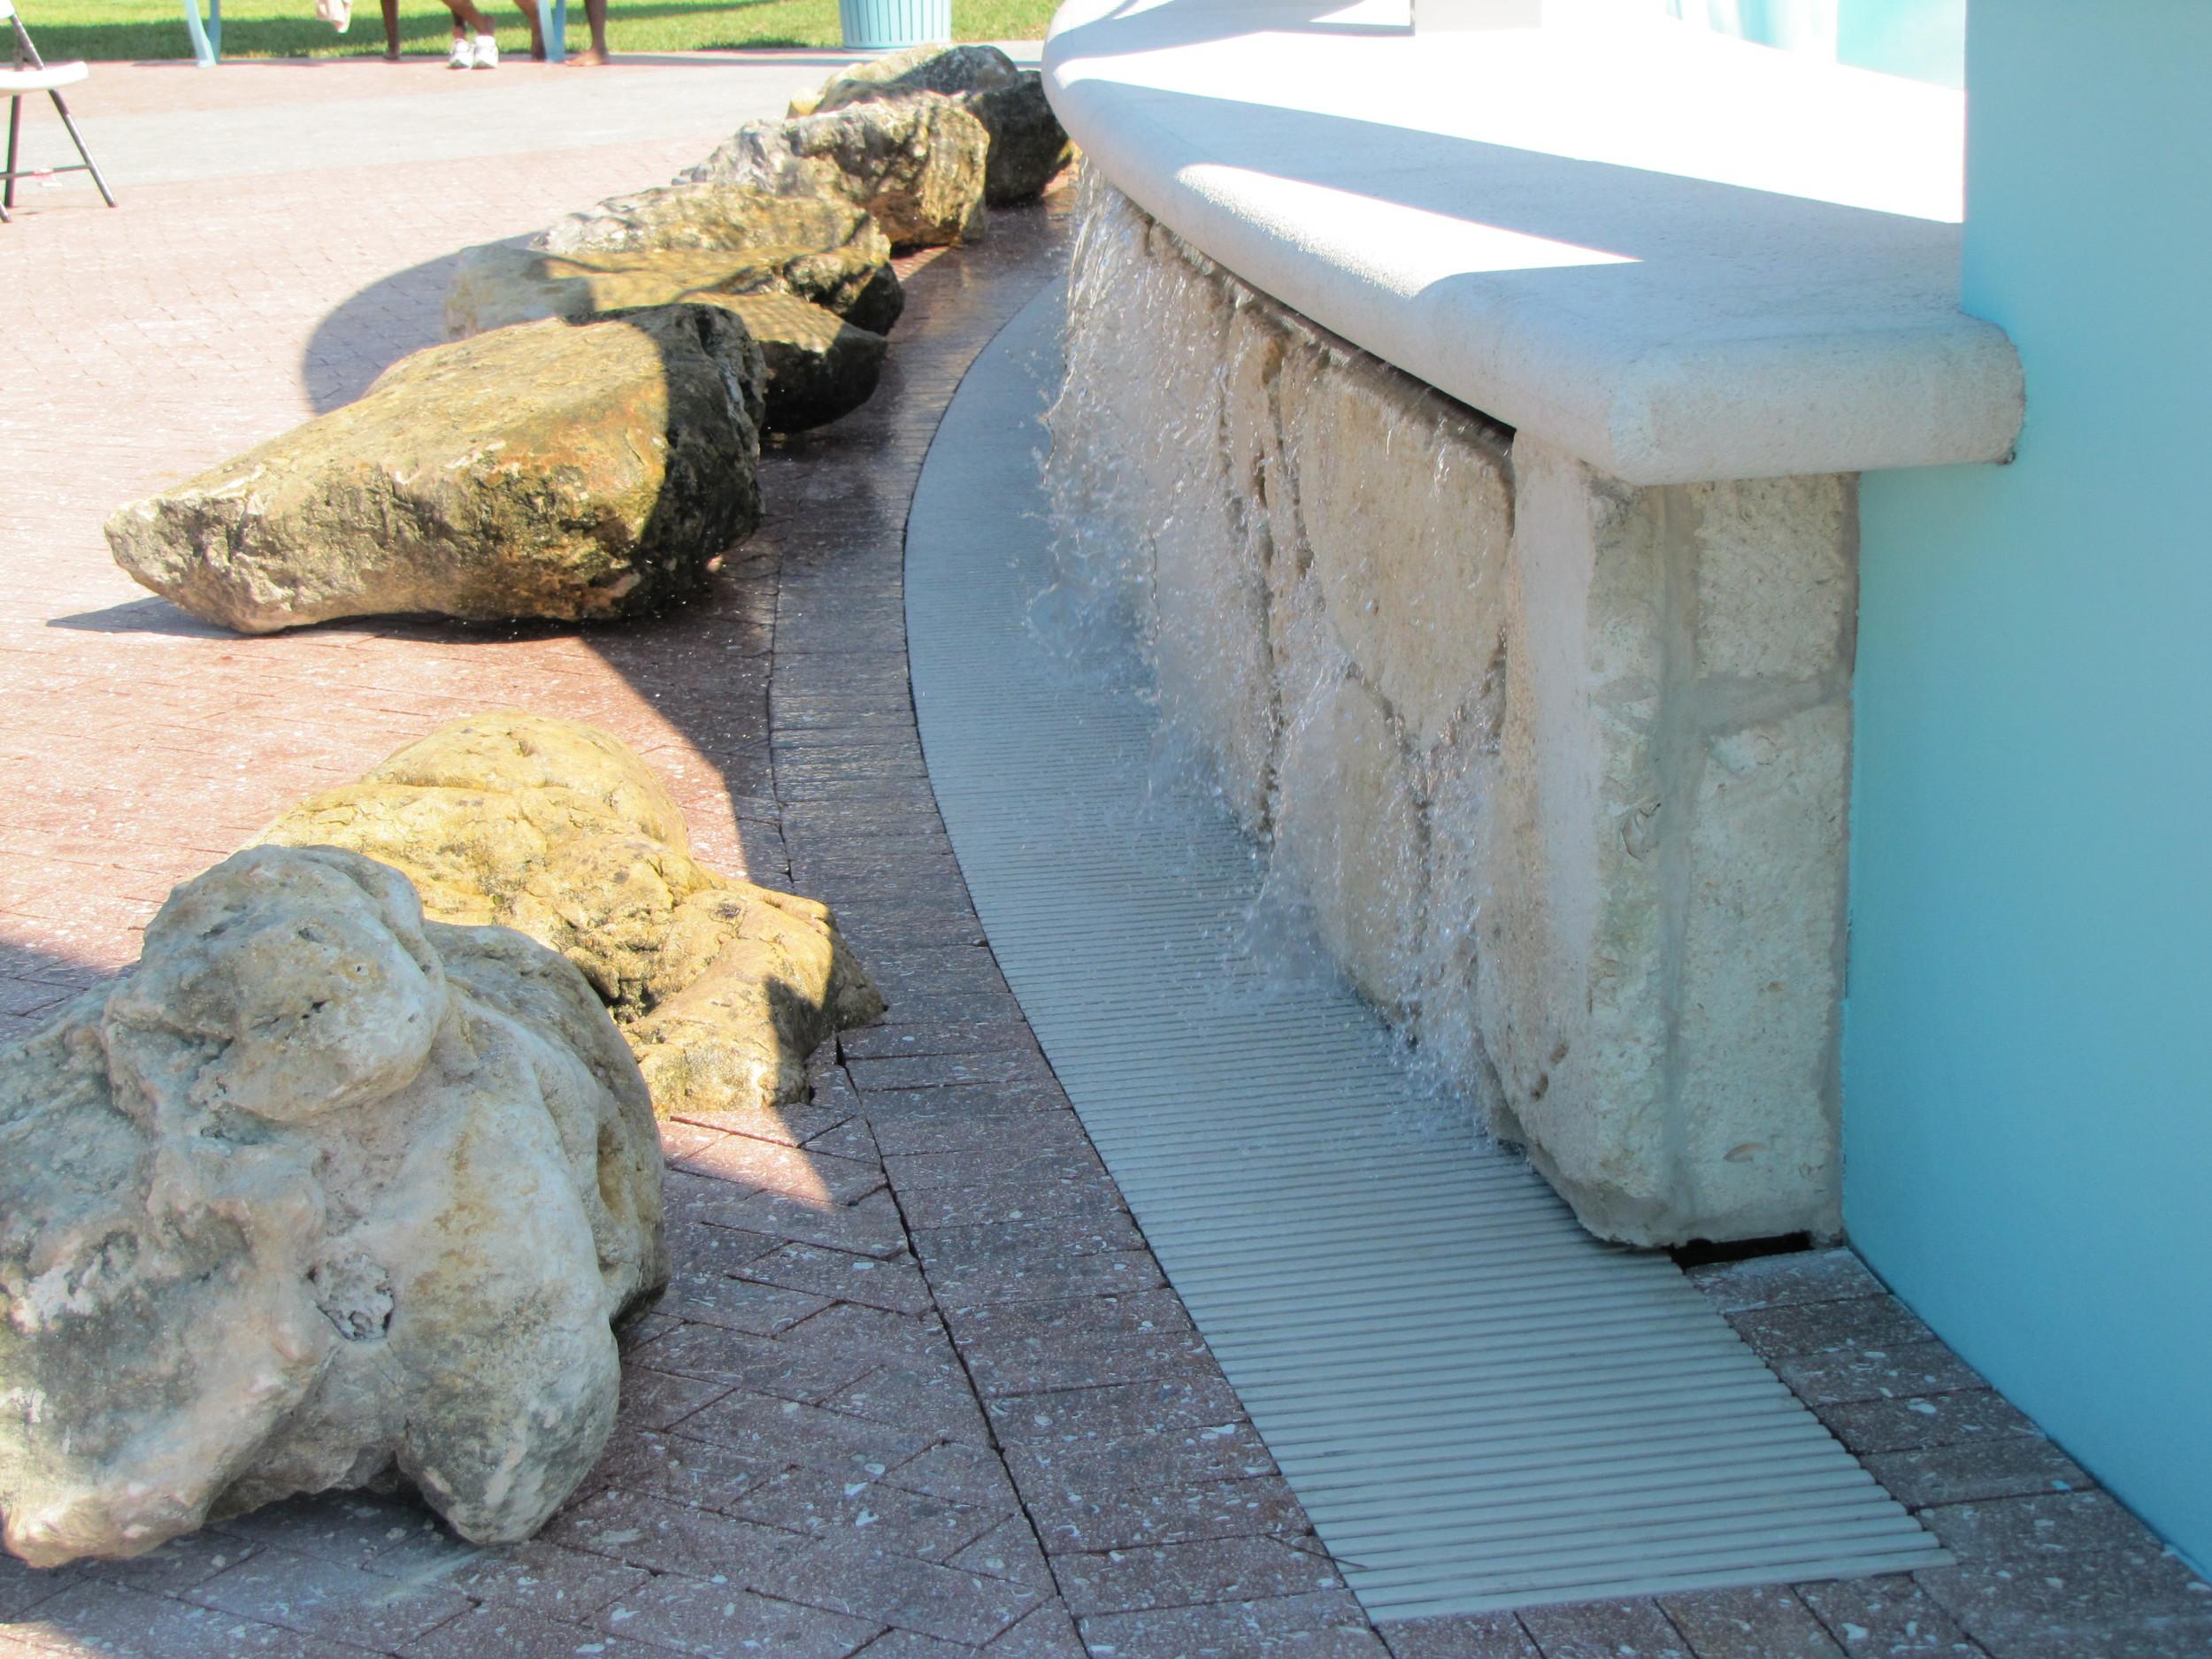 City of Riviera Beach Municipal Beach Park Ocean Mall Fountain With Caprock and Trench Drain.jpg